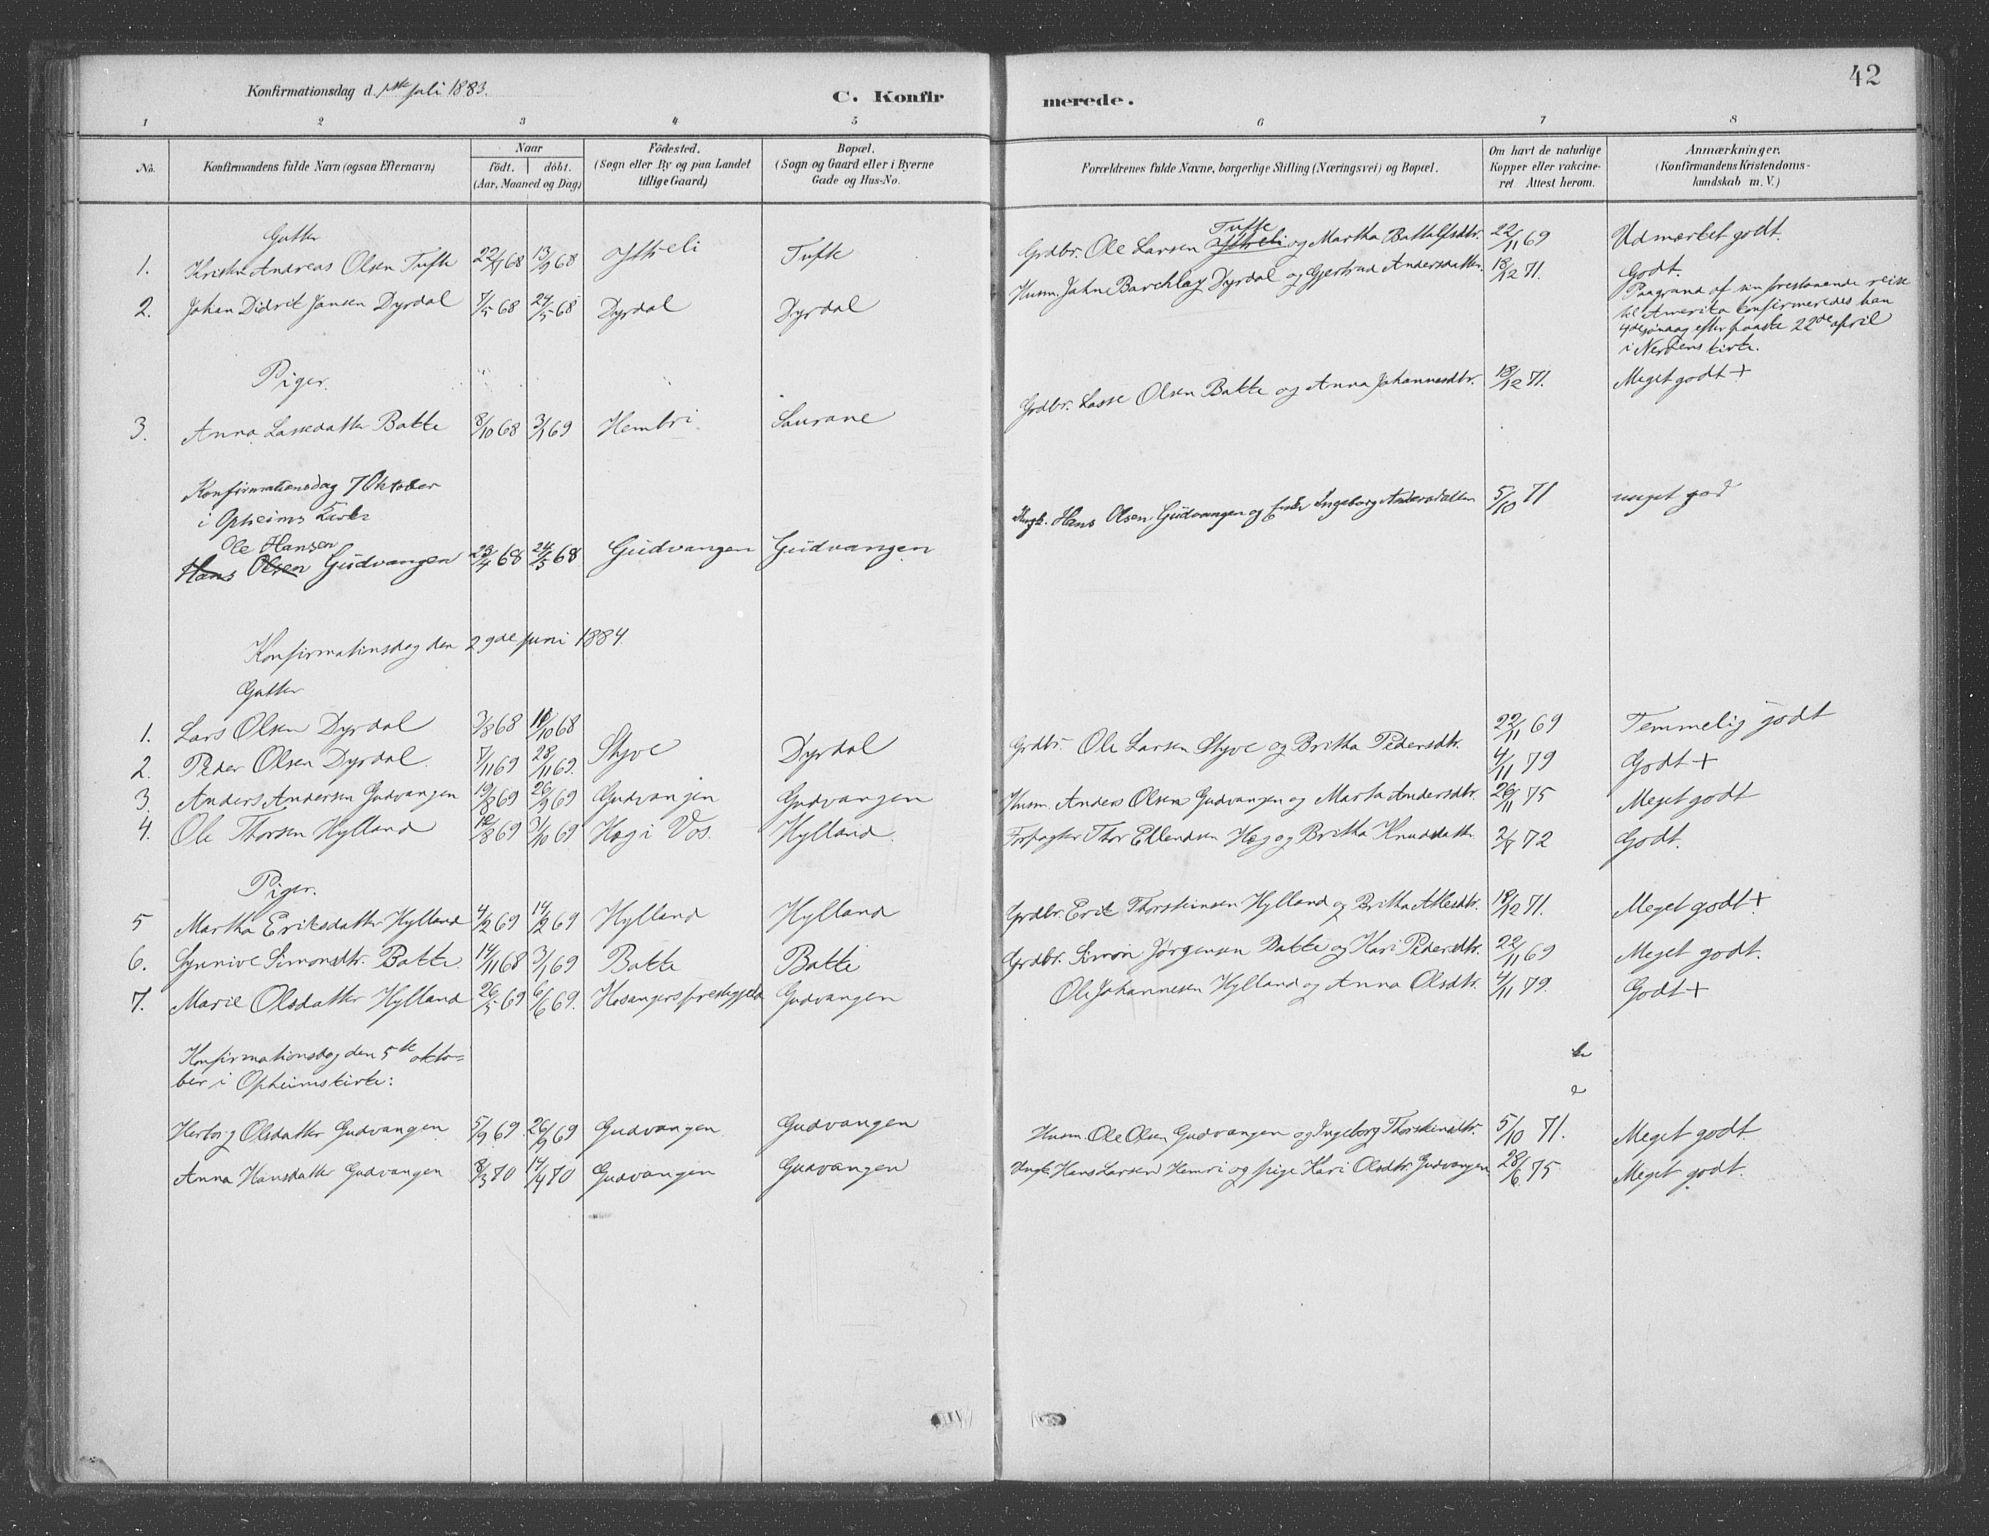 SAB, Aurland sokneprestembete, H/Ha/Had/L0001: Ministerialbok nr. D  1, 1880-1903, s. 42